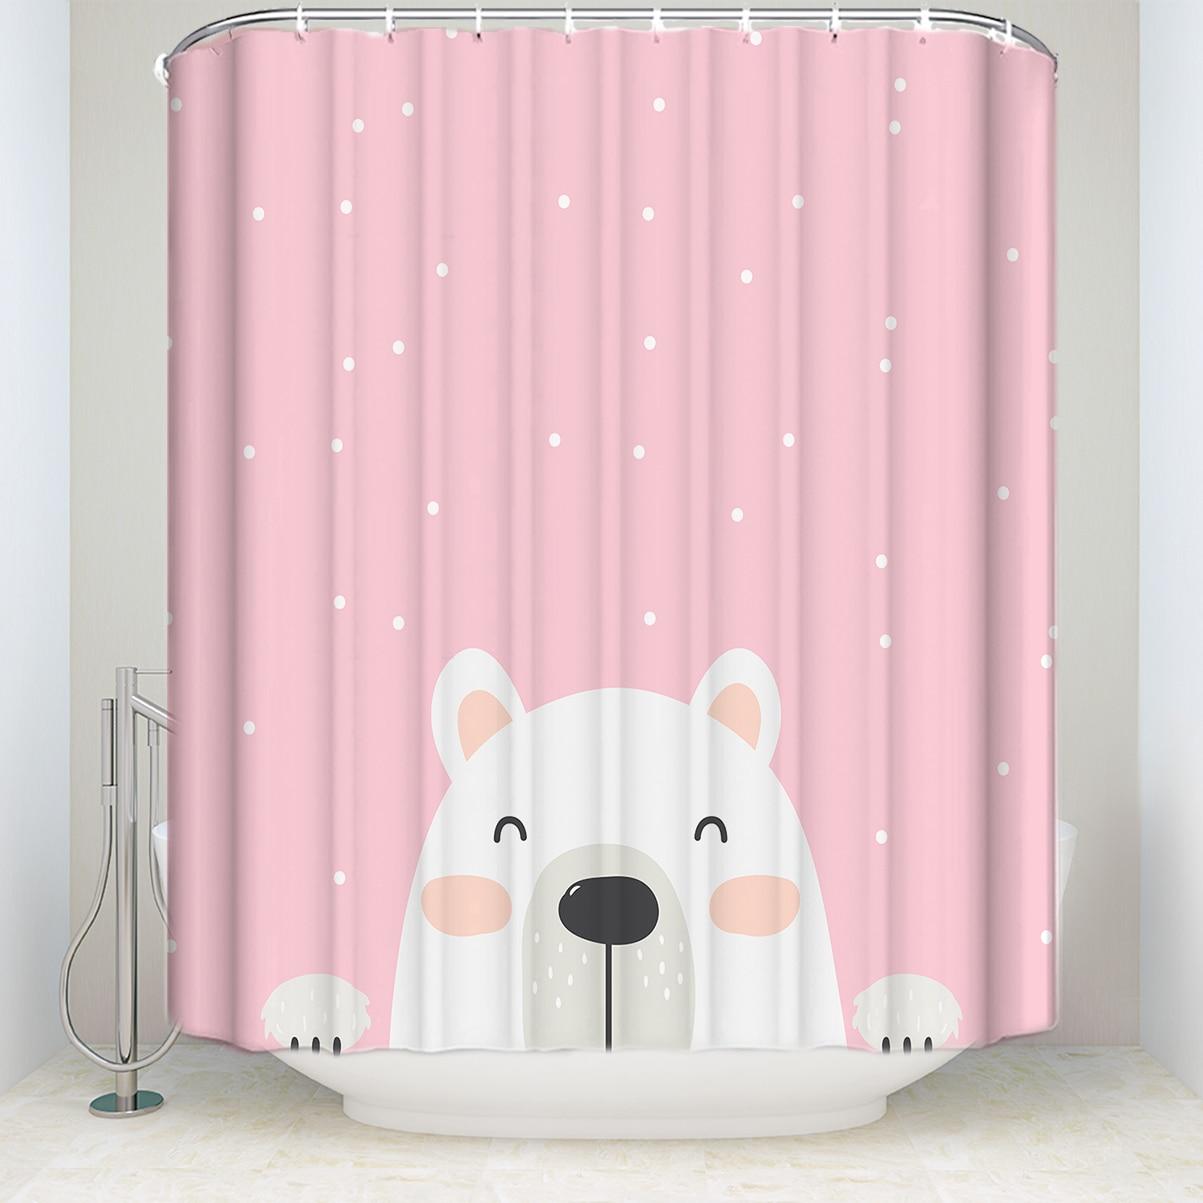 Us 17 34 35 Off Custom Waterproof Bathroom Cute Cartoon Bear Print Shower Curtain Polyester Fabric Spot Pink Bathroom Curtain In Shower Curtains